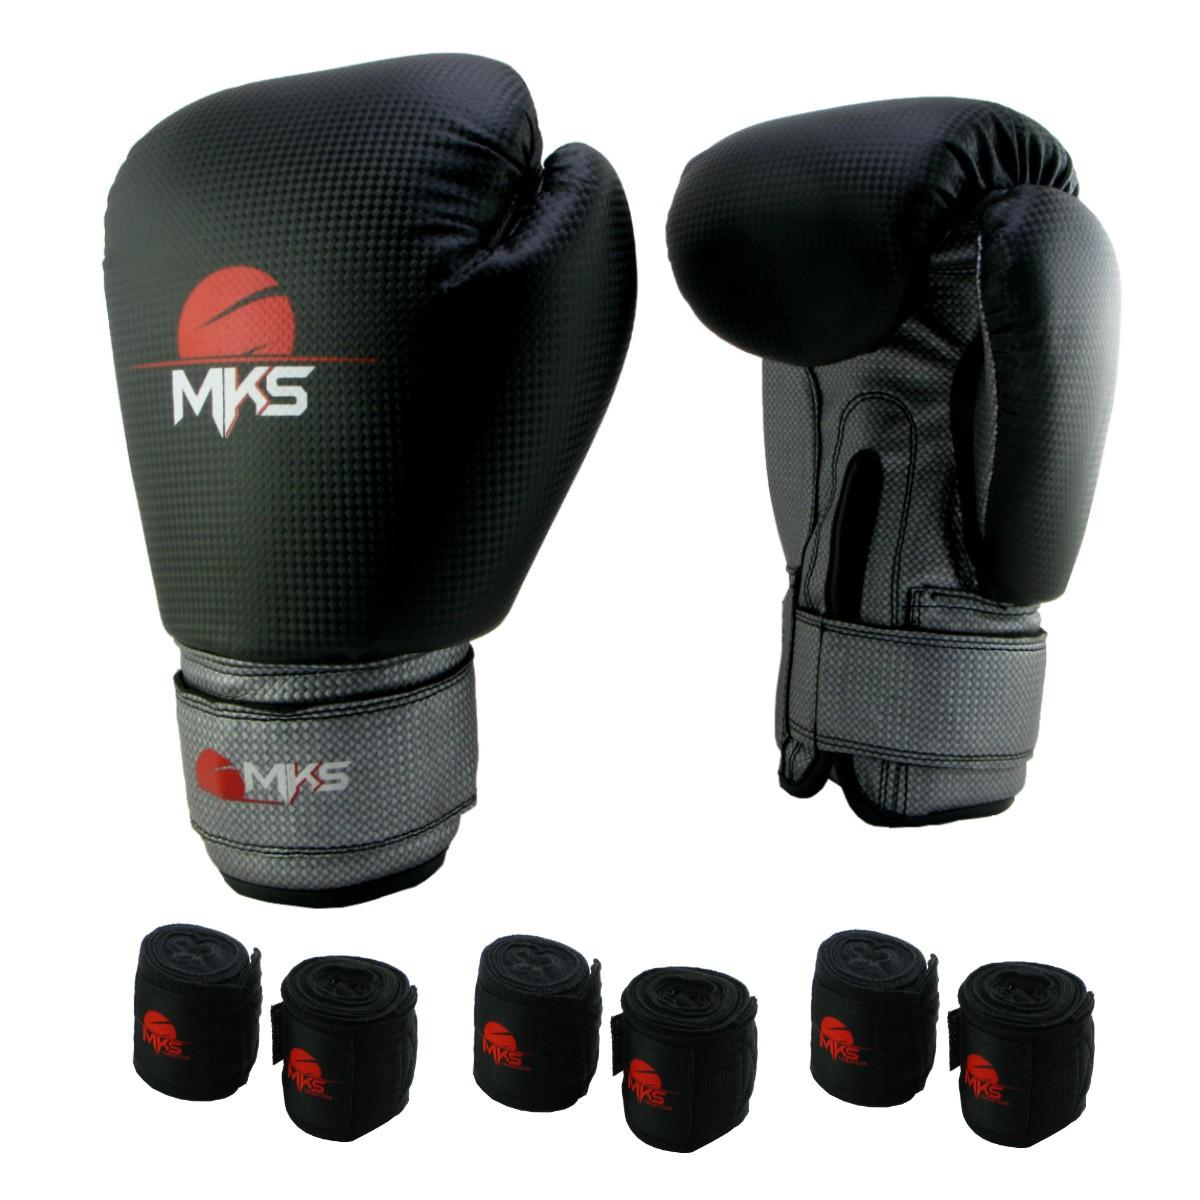 Luva de Boxe Prospect MKS Black & Silver 16 oz +  03 bandagem